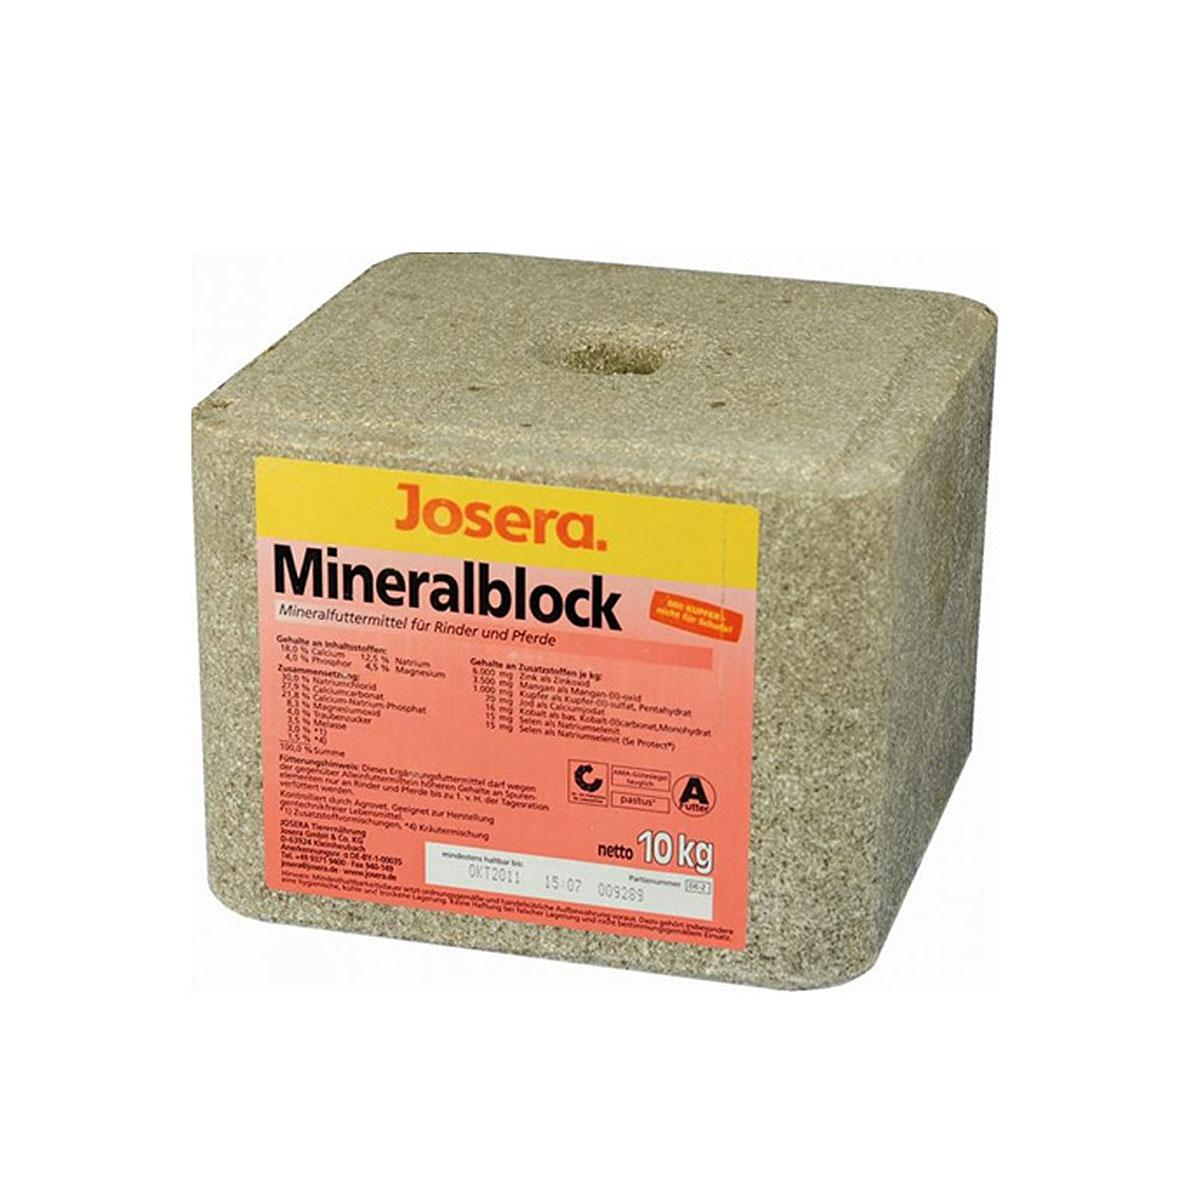 josera mineralblock 10kg g nstig kaufen bei zooroyal. Black Bedroom Furniture Sets. Home Design Ideas